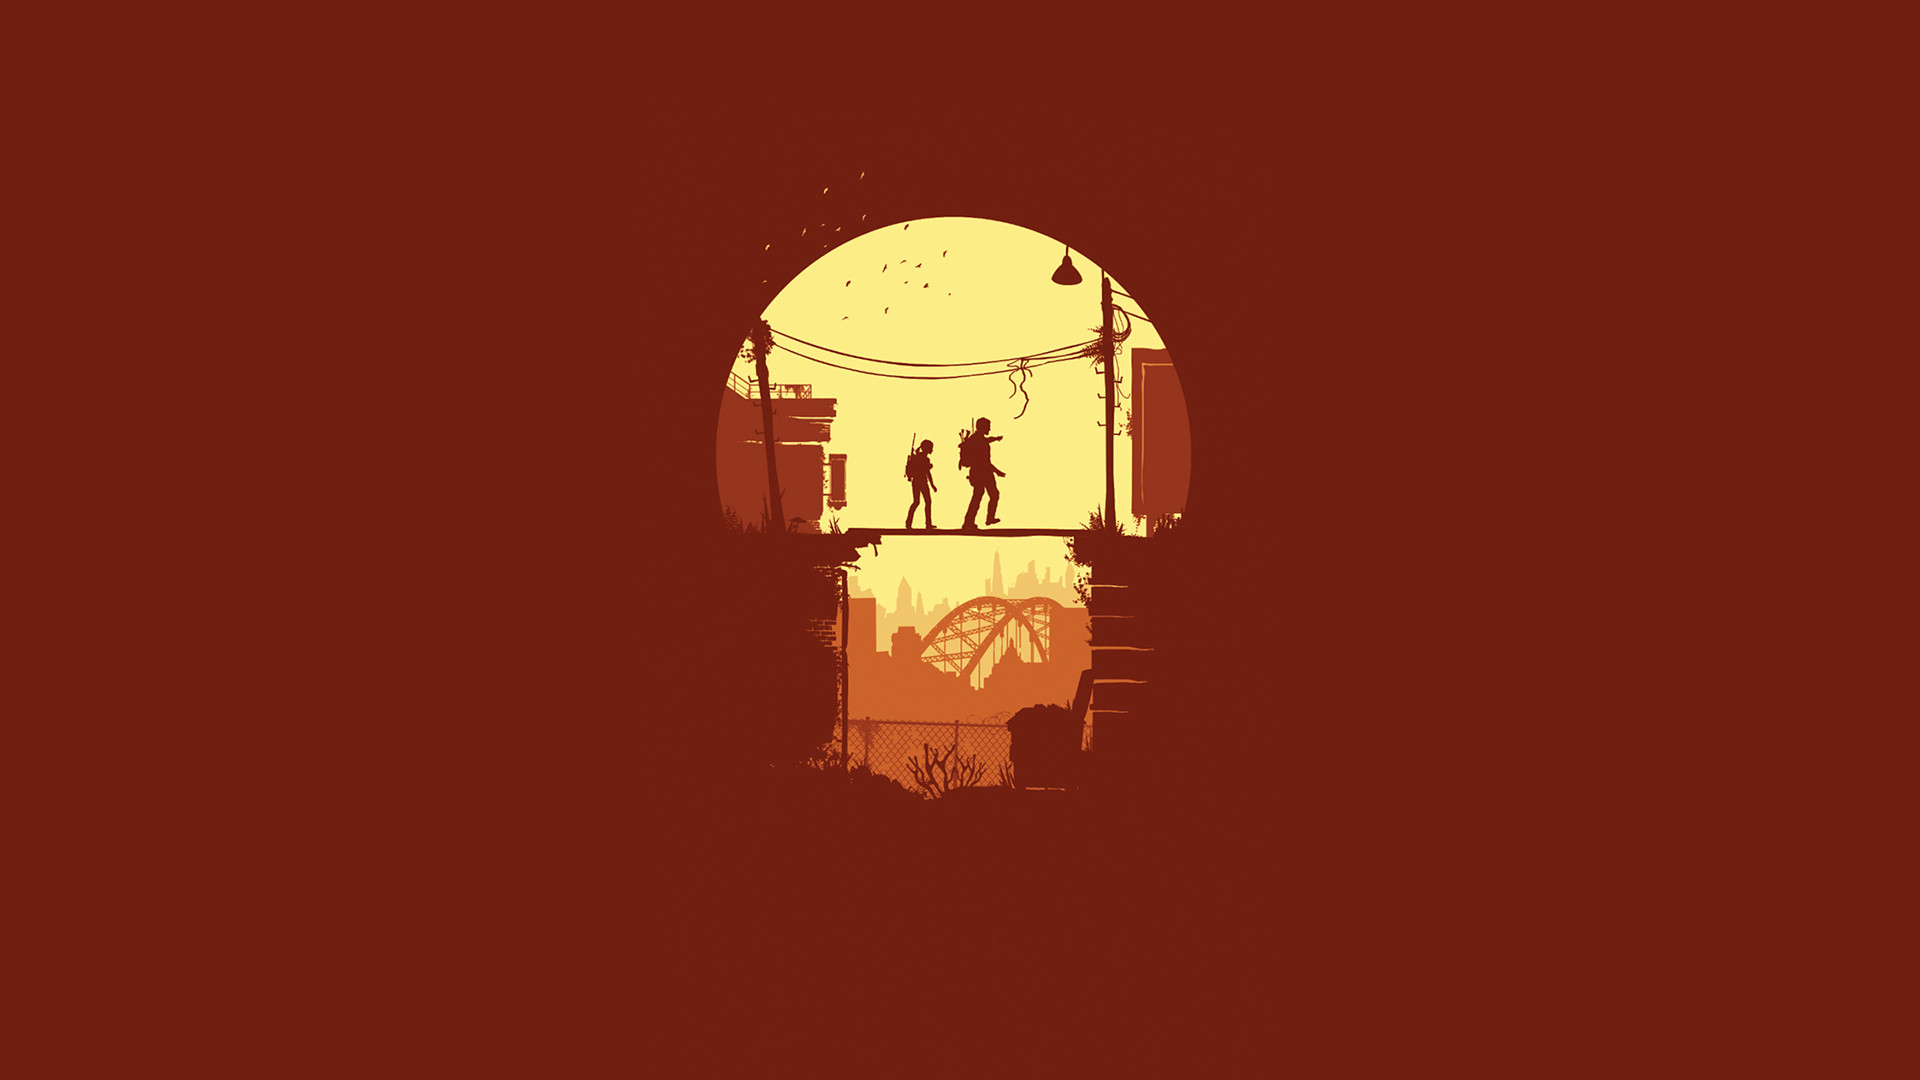 Disney Minimalist Wallpaper (77+ images)